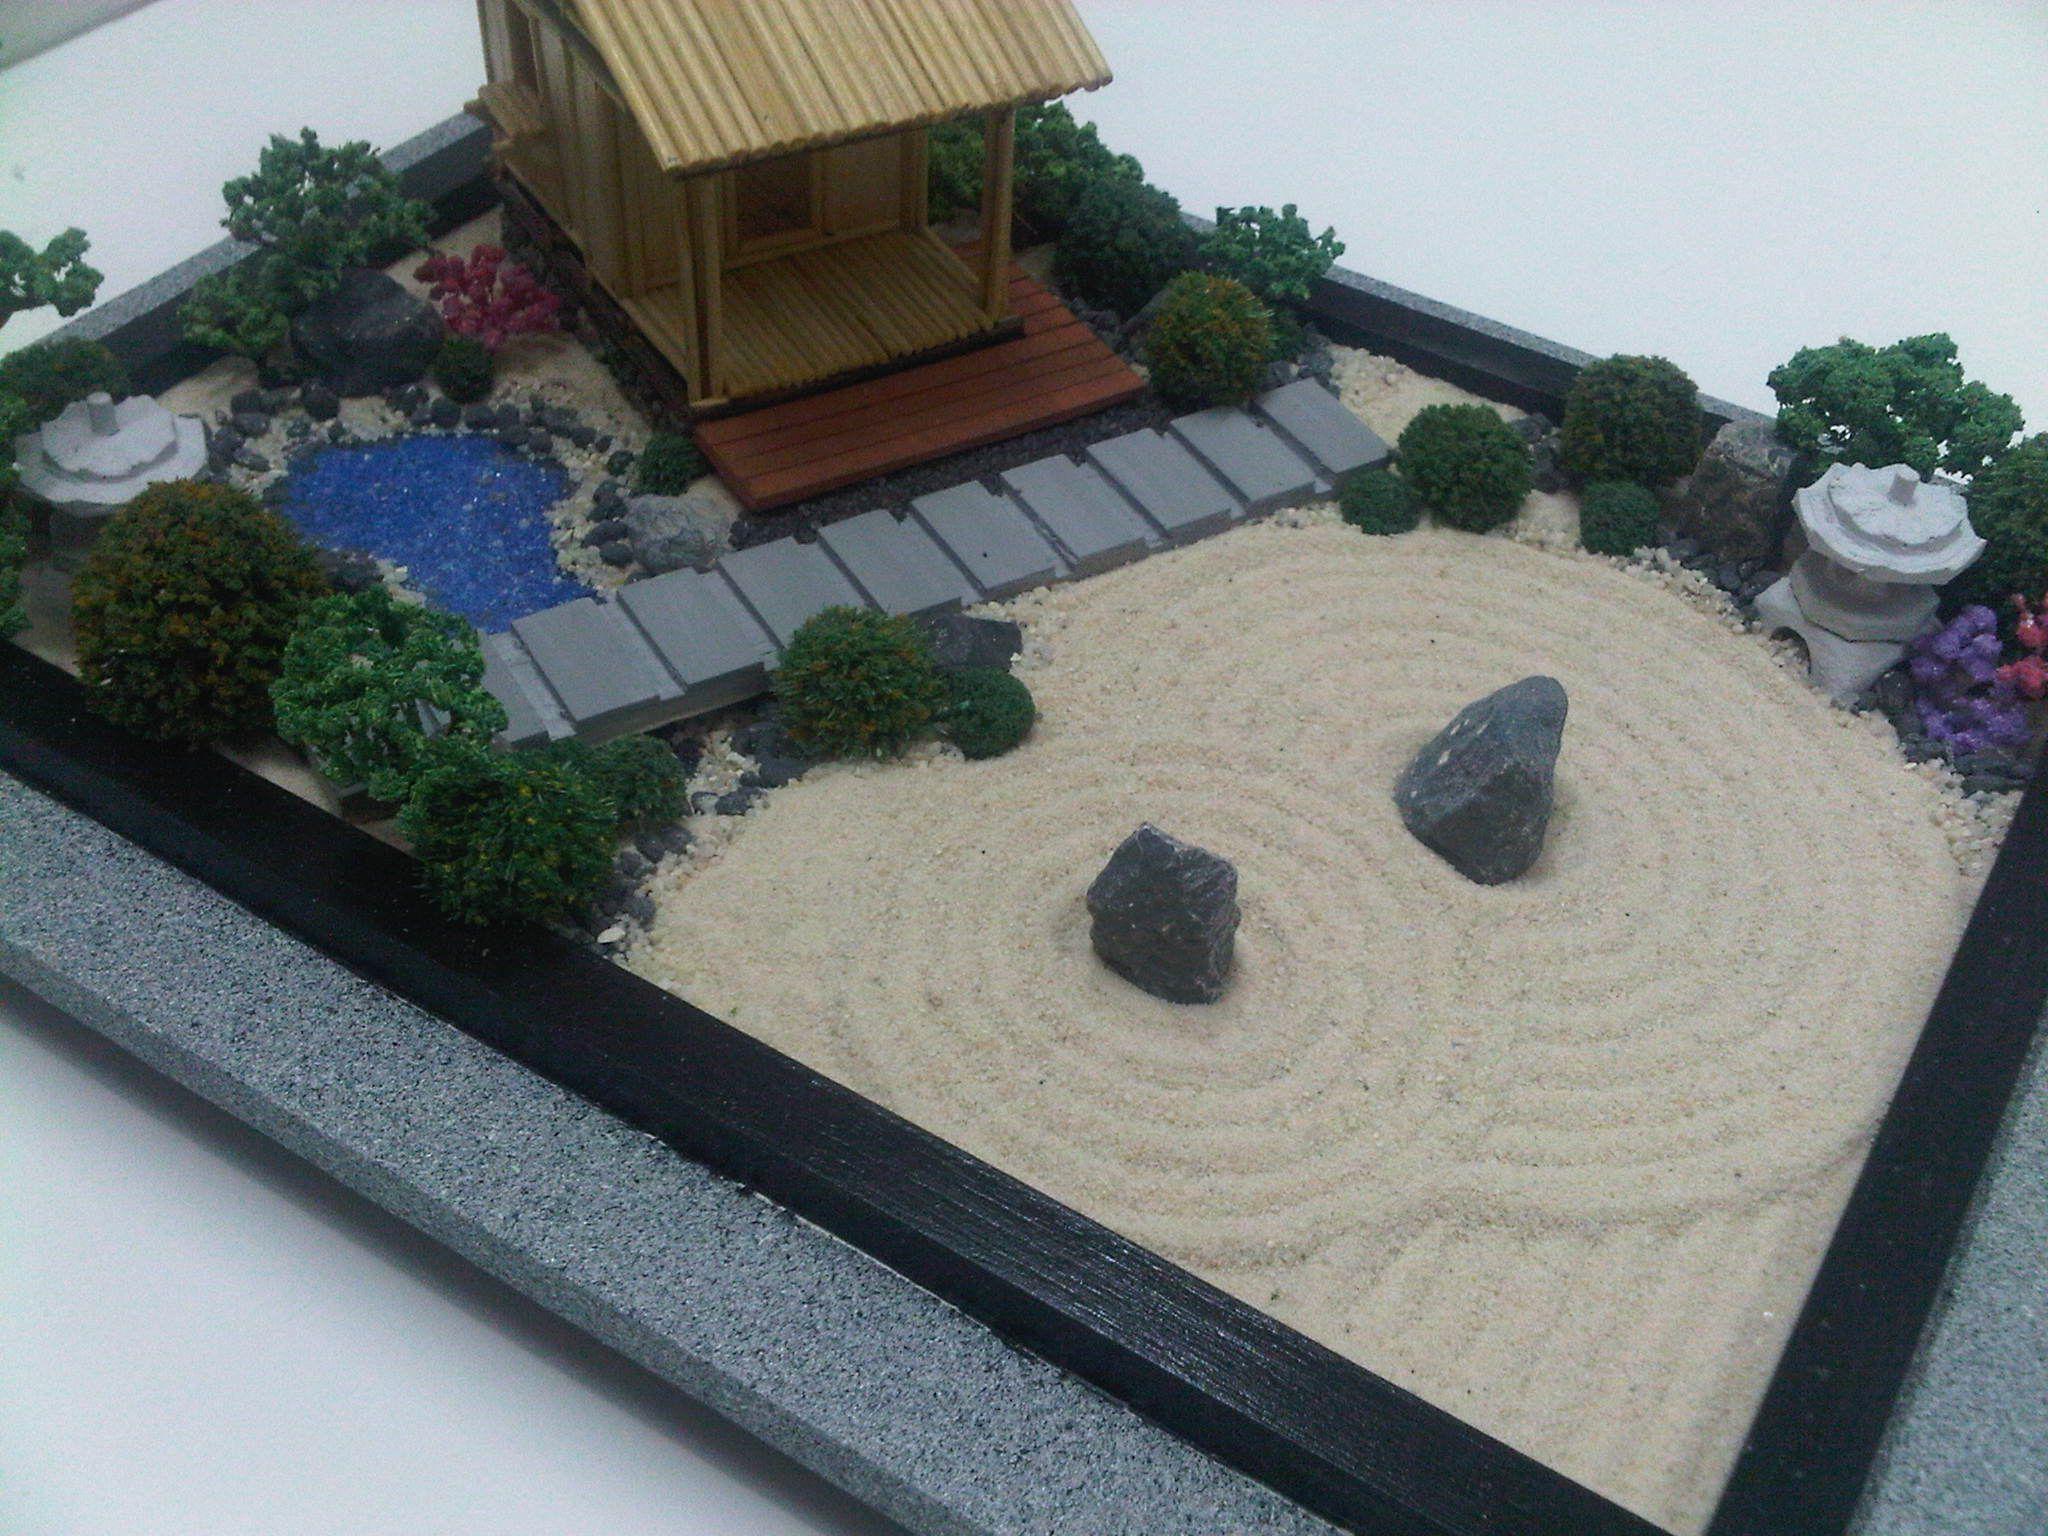 A Tea House Miniature Zen Garden Design Concept By Wallzart Miniature Zen Garden Zen Garden Zen Garden Design